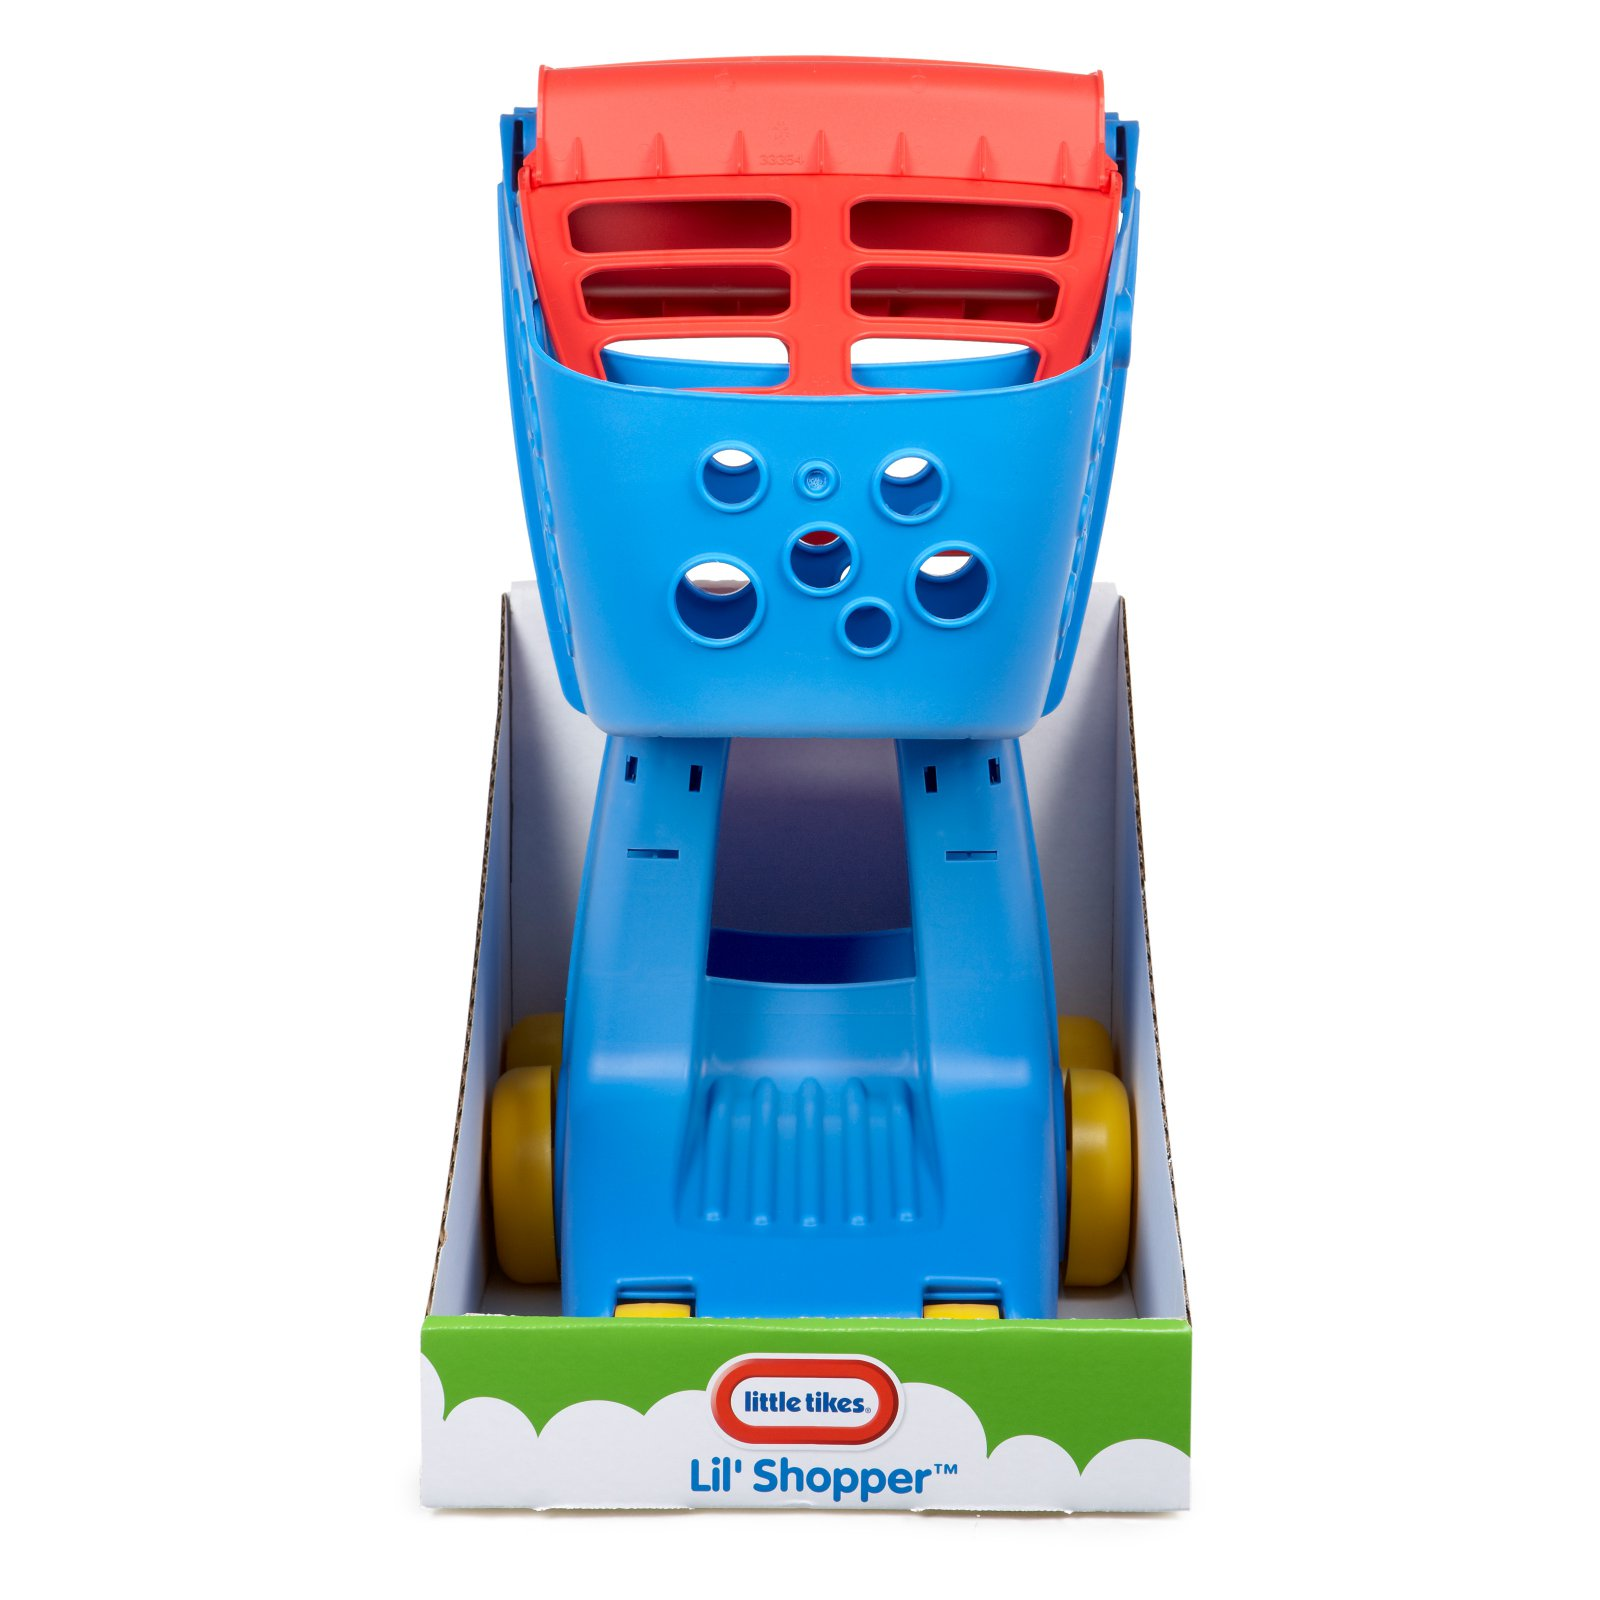 Incredible Little Tikes Lil Shopper Blue Dailytribune Chair Design For Home Dailytribuneorg